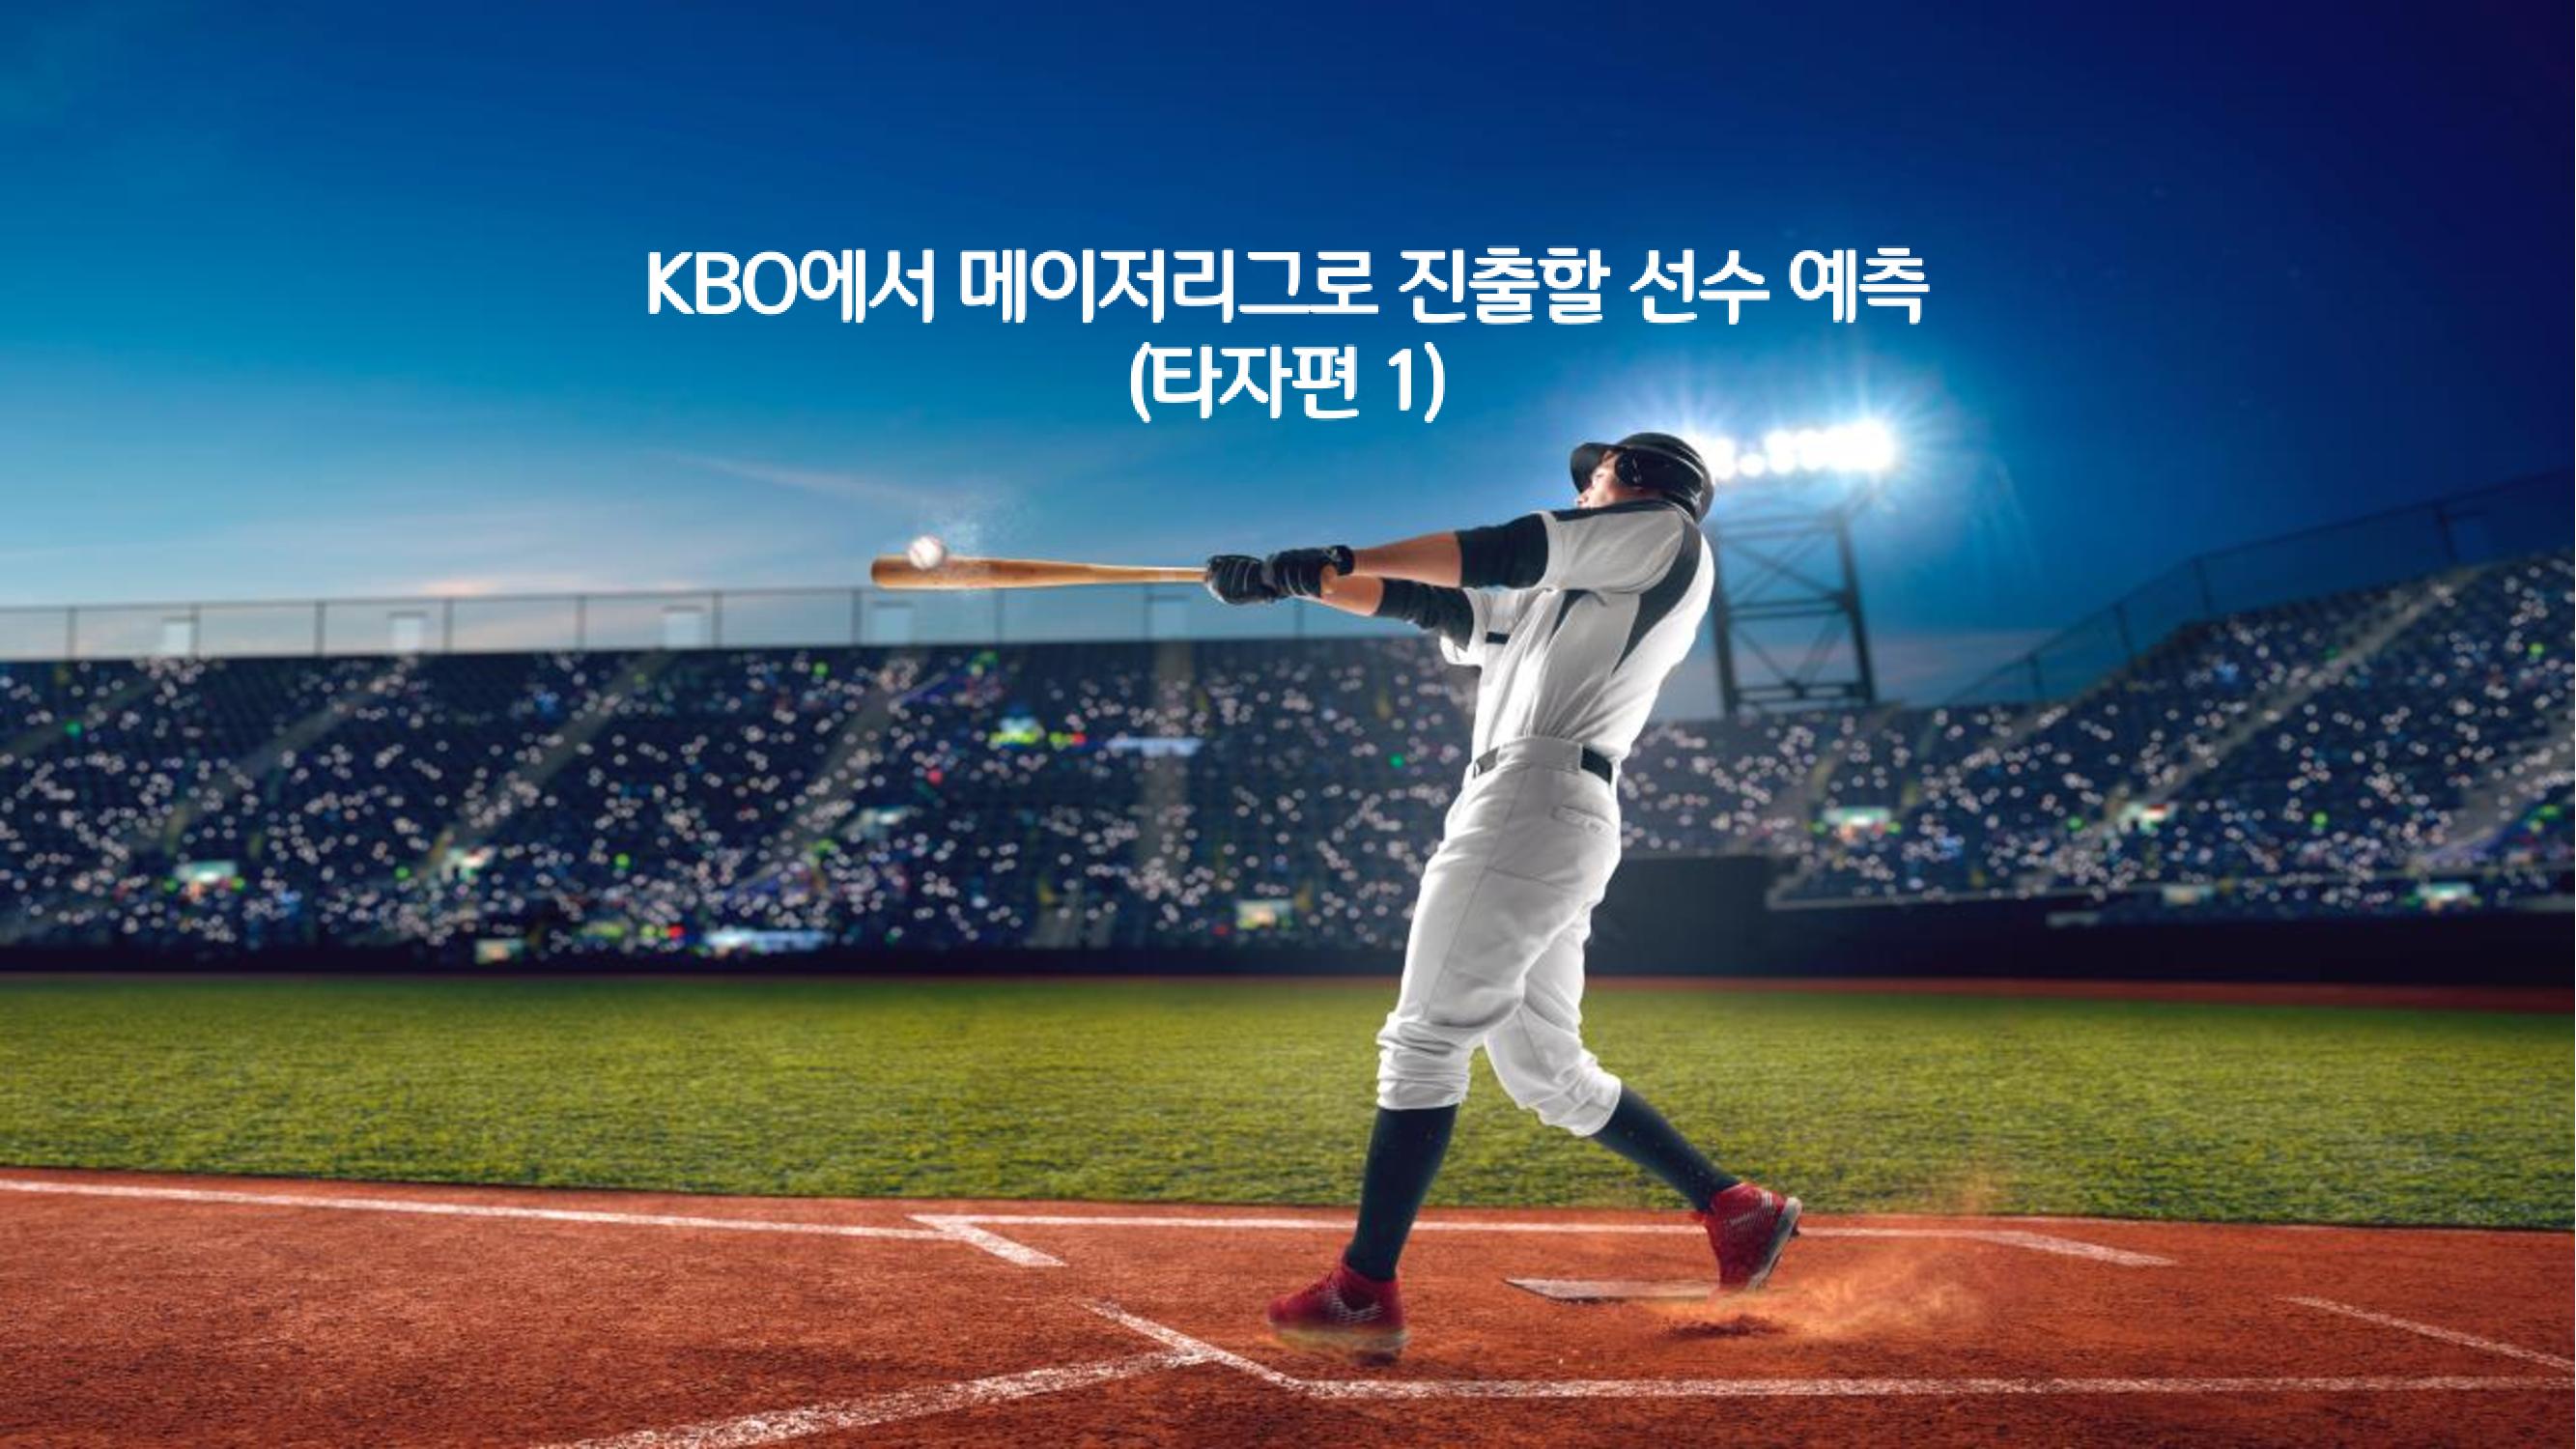 KBO에서 메이저리그로 진출할 선수 예측 (타자편 1)